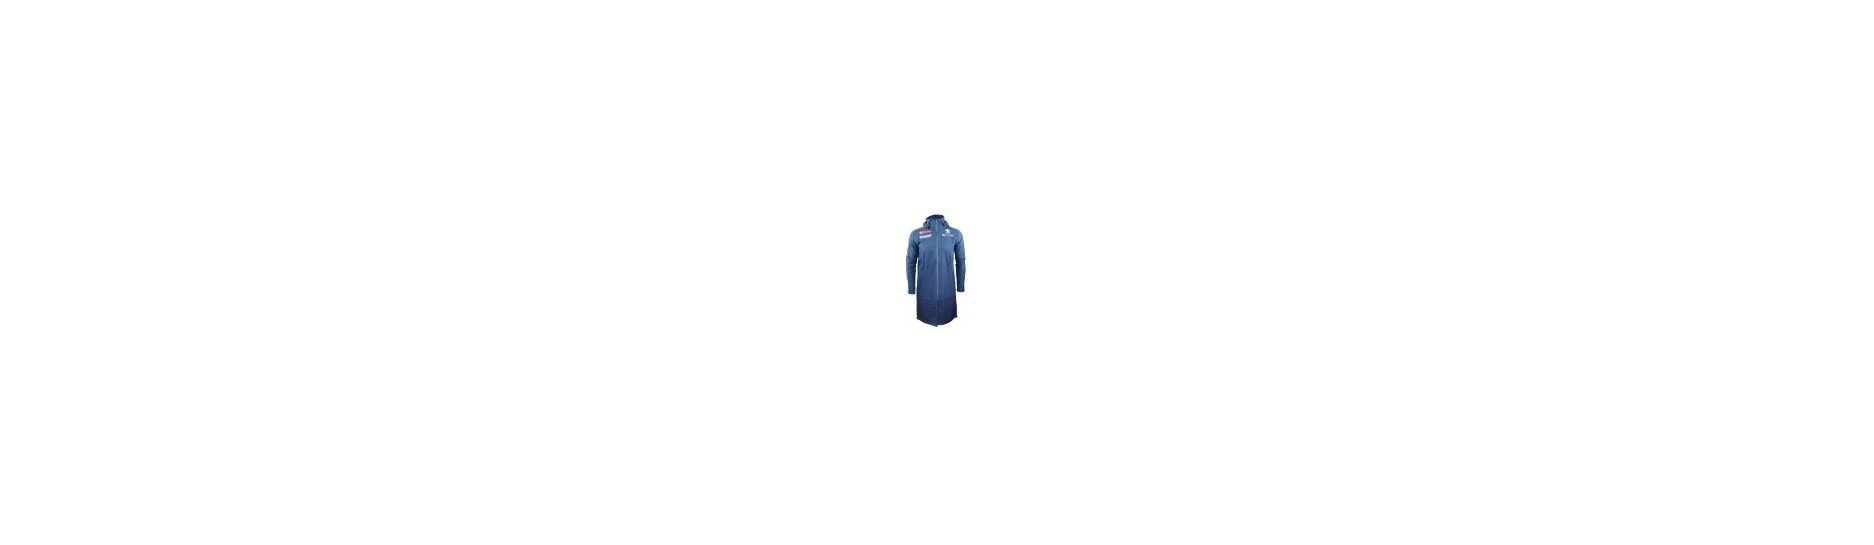 Peugeot coats and sport jackets